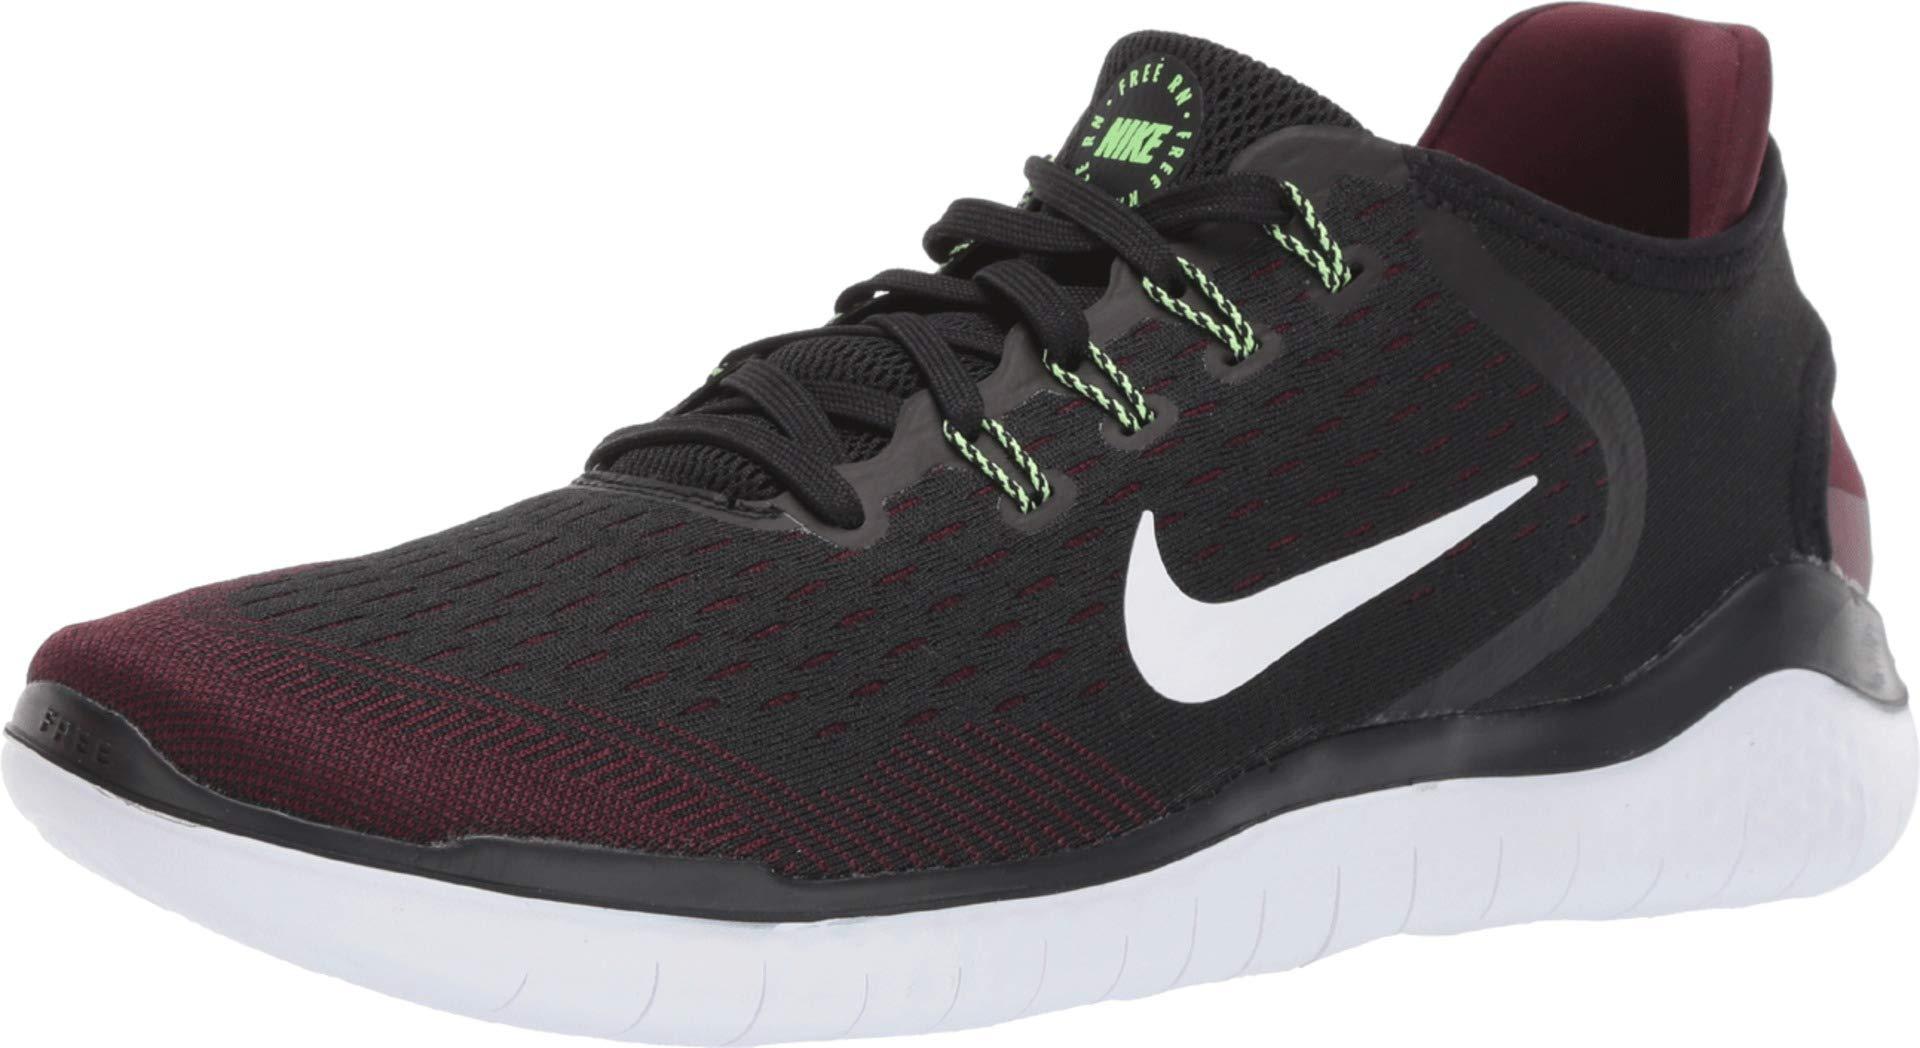 Nike Men's Free RN 2018 Night Maroon/Black/Lime Blast 7 D US